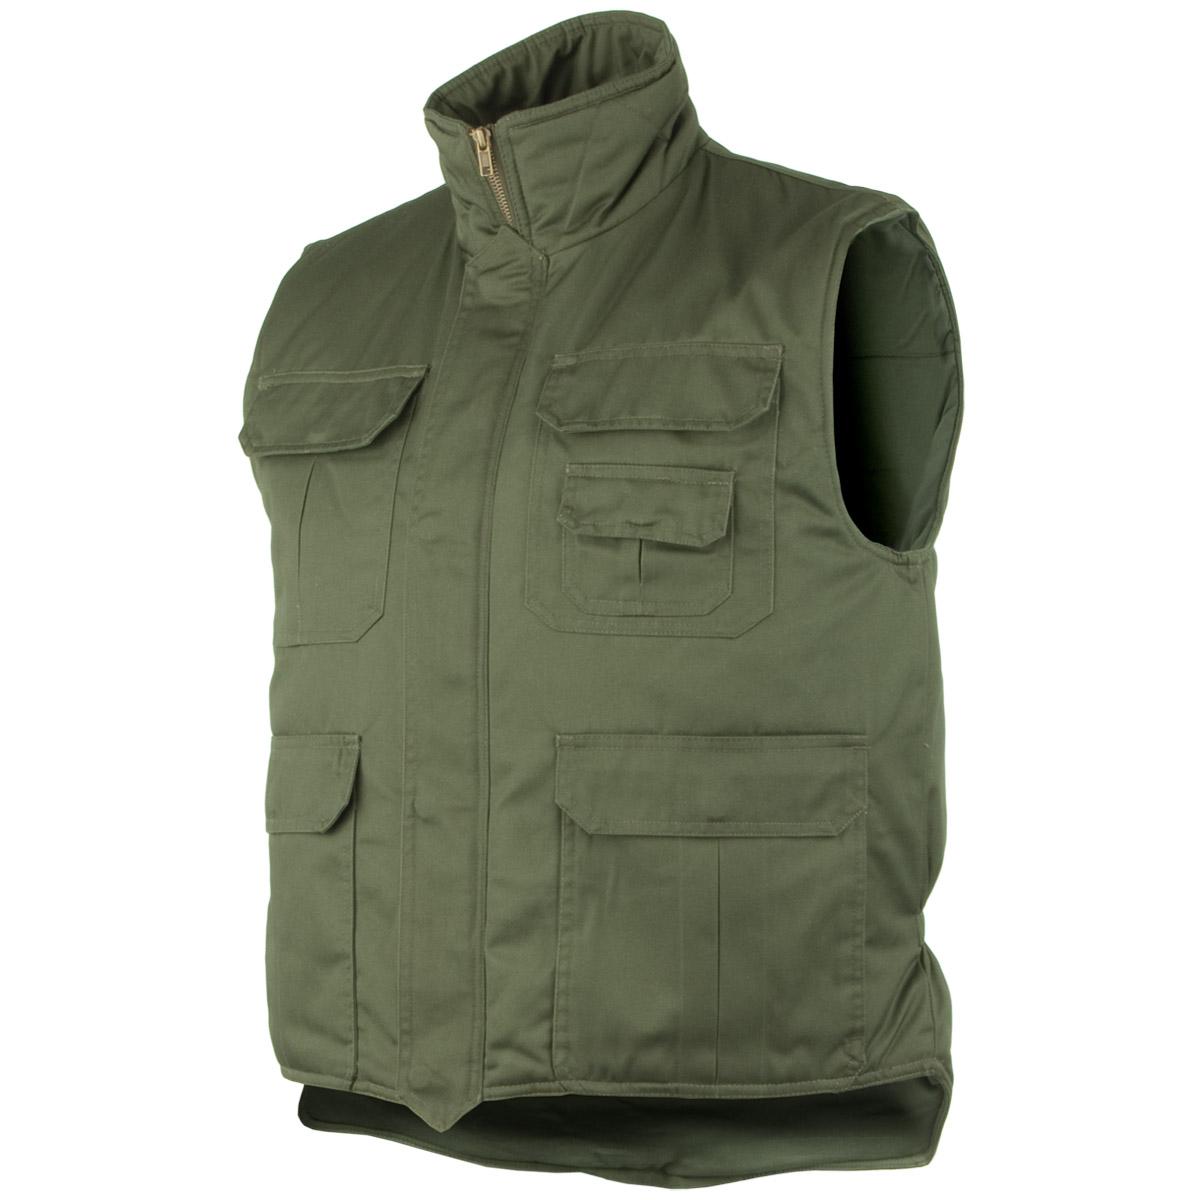 army body warmer padded mens vest fishing jacket hunting. Black Bedroom Furniture Sets. Home Design Ideas